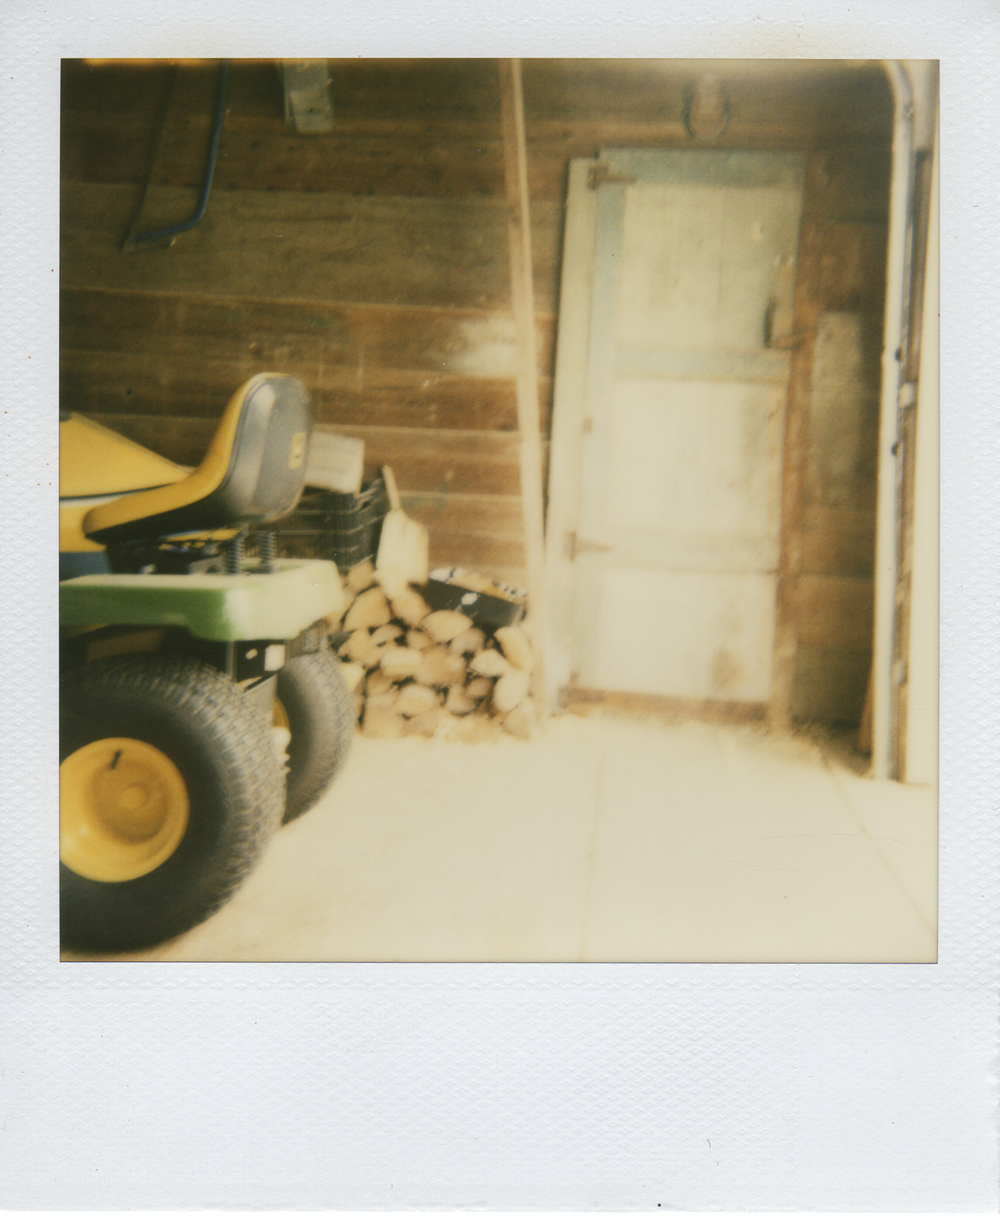 jlaurence-polaroid-097.jpg